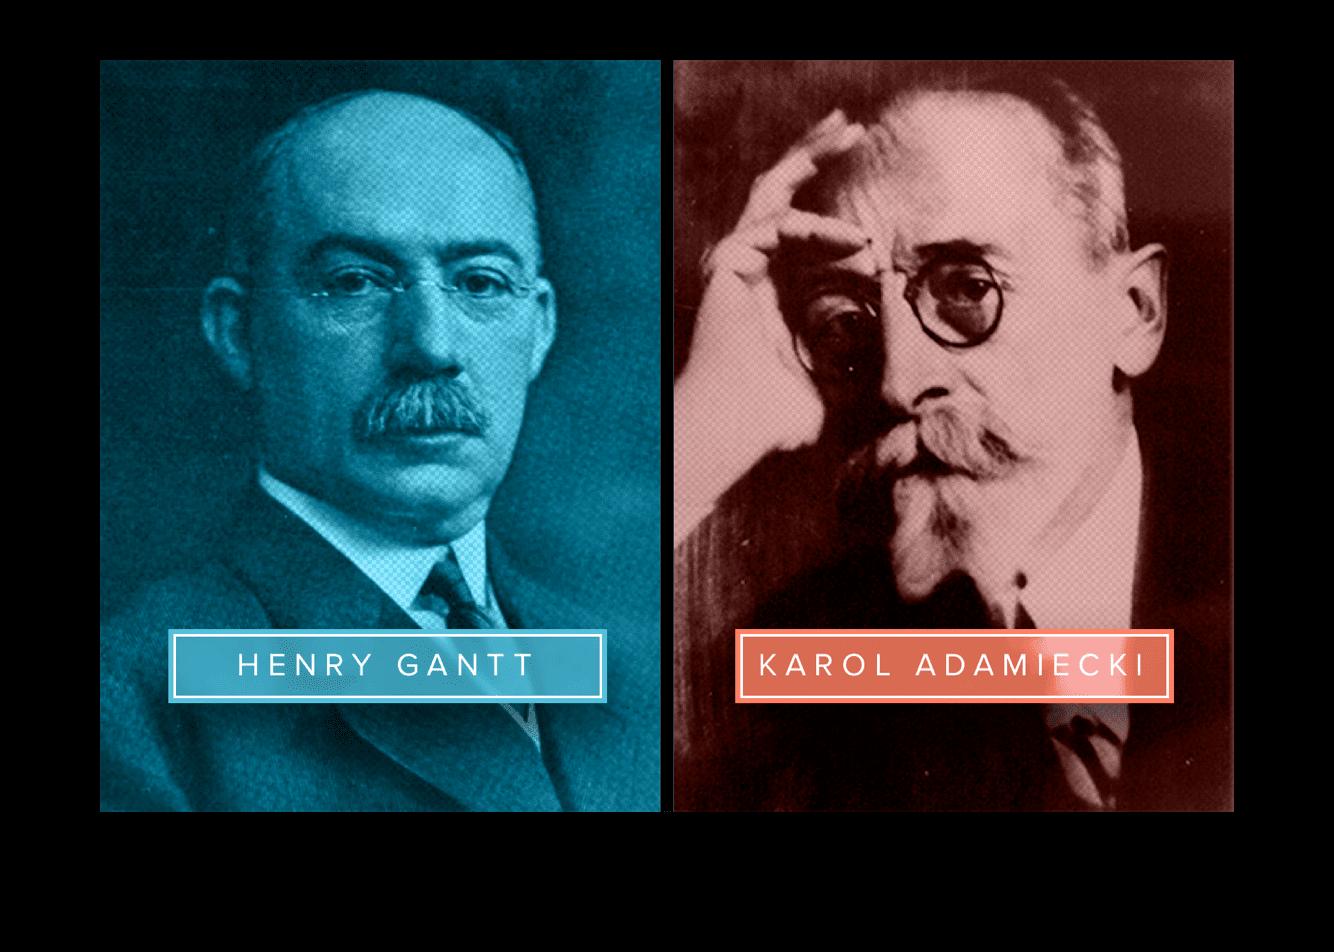 Side-by-side photos of Henry Gantt and Karol Adamiecki